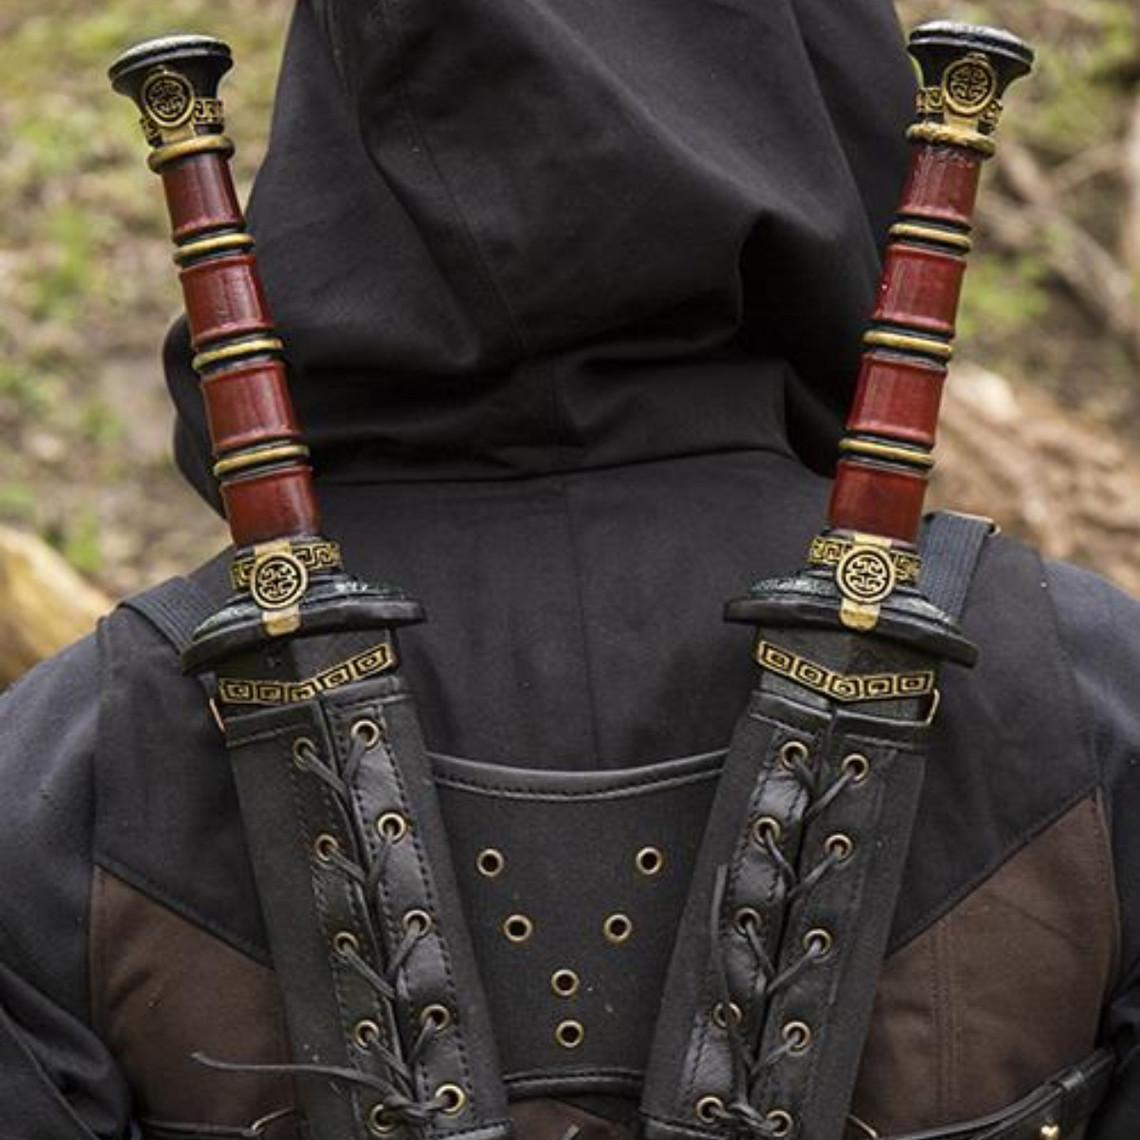 Epic Armoury RFB Dubbele LARP zwaardhouder, zwart